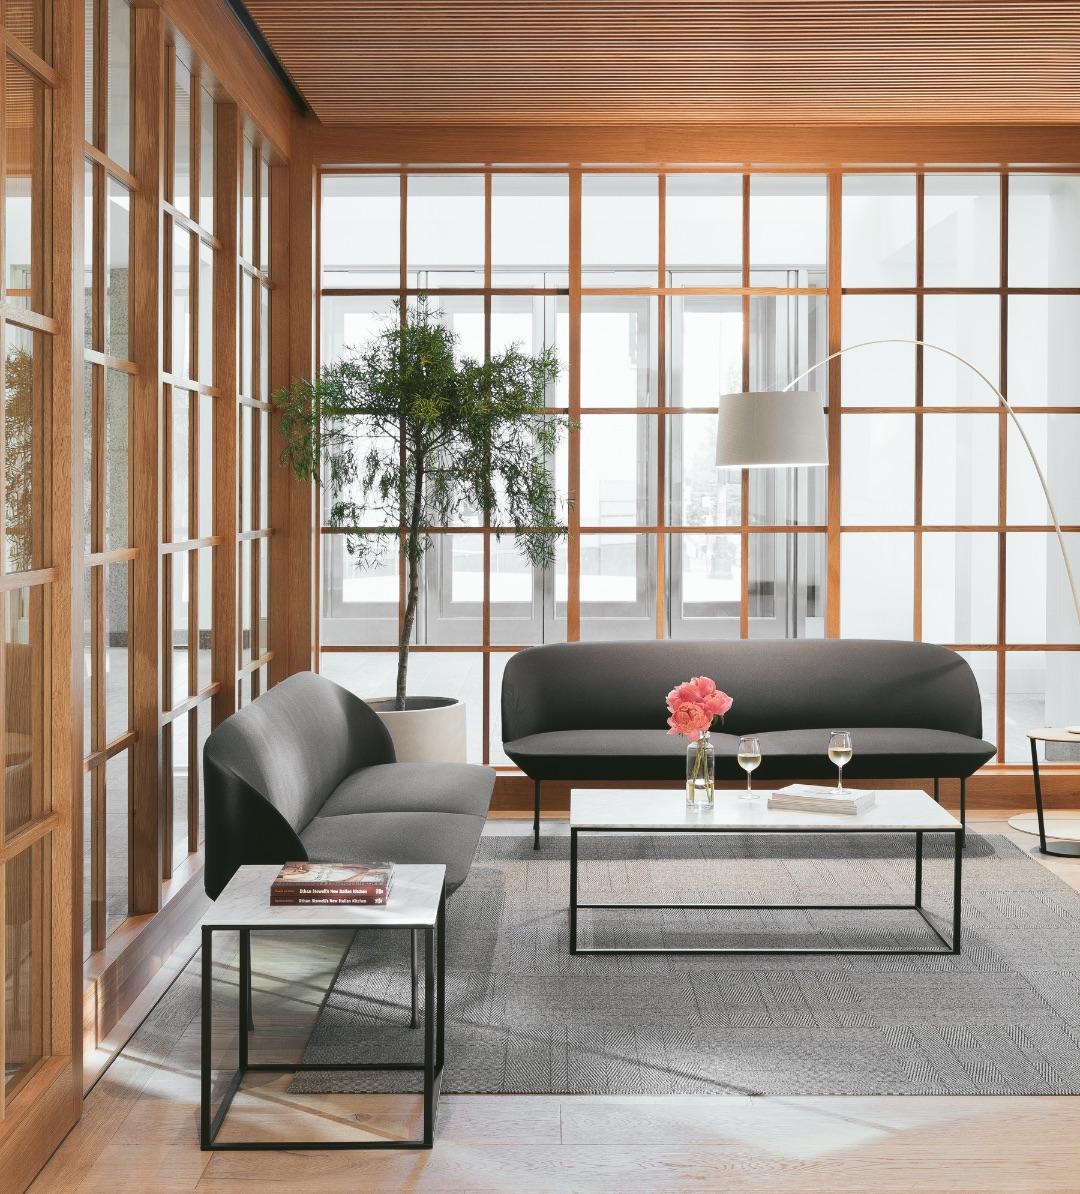 3_Heliotrope Architects_Cortina Restaurant_Inspirationist